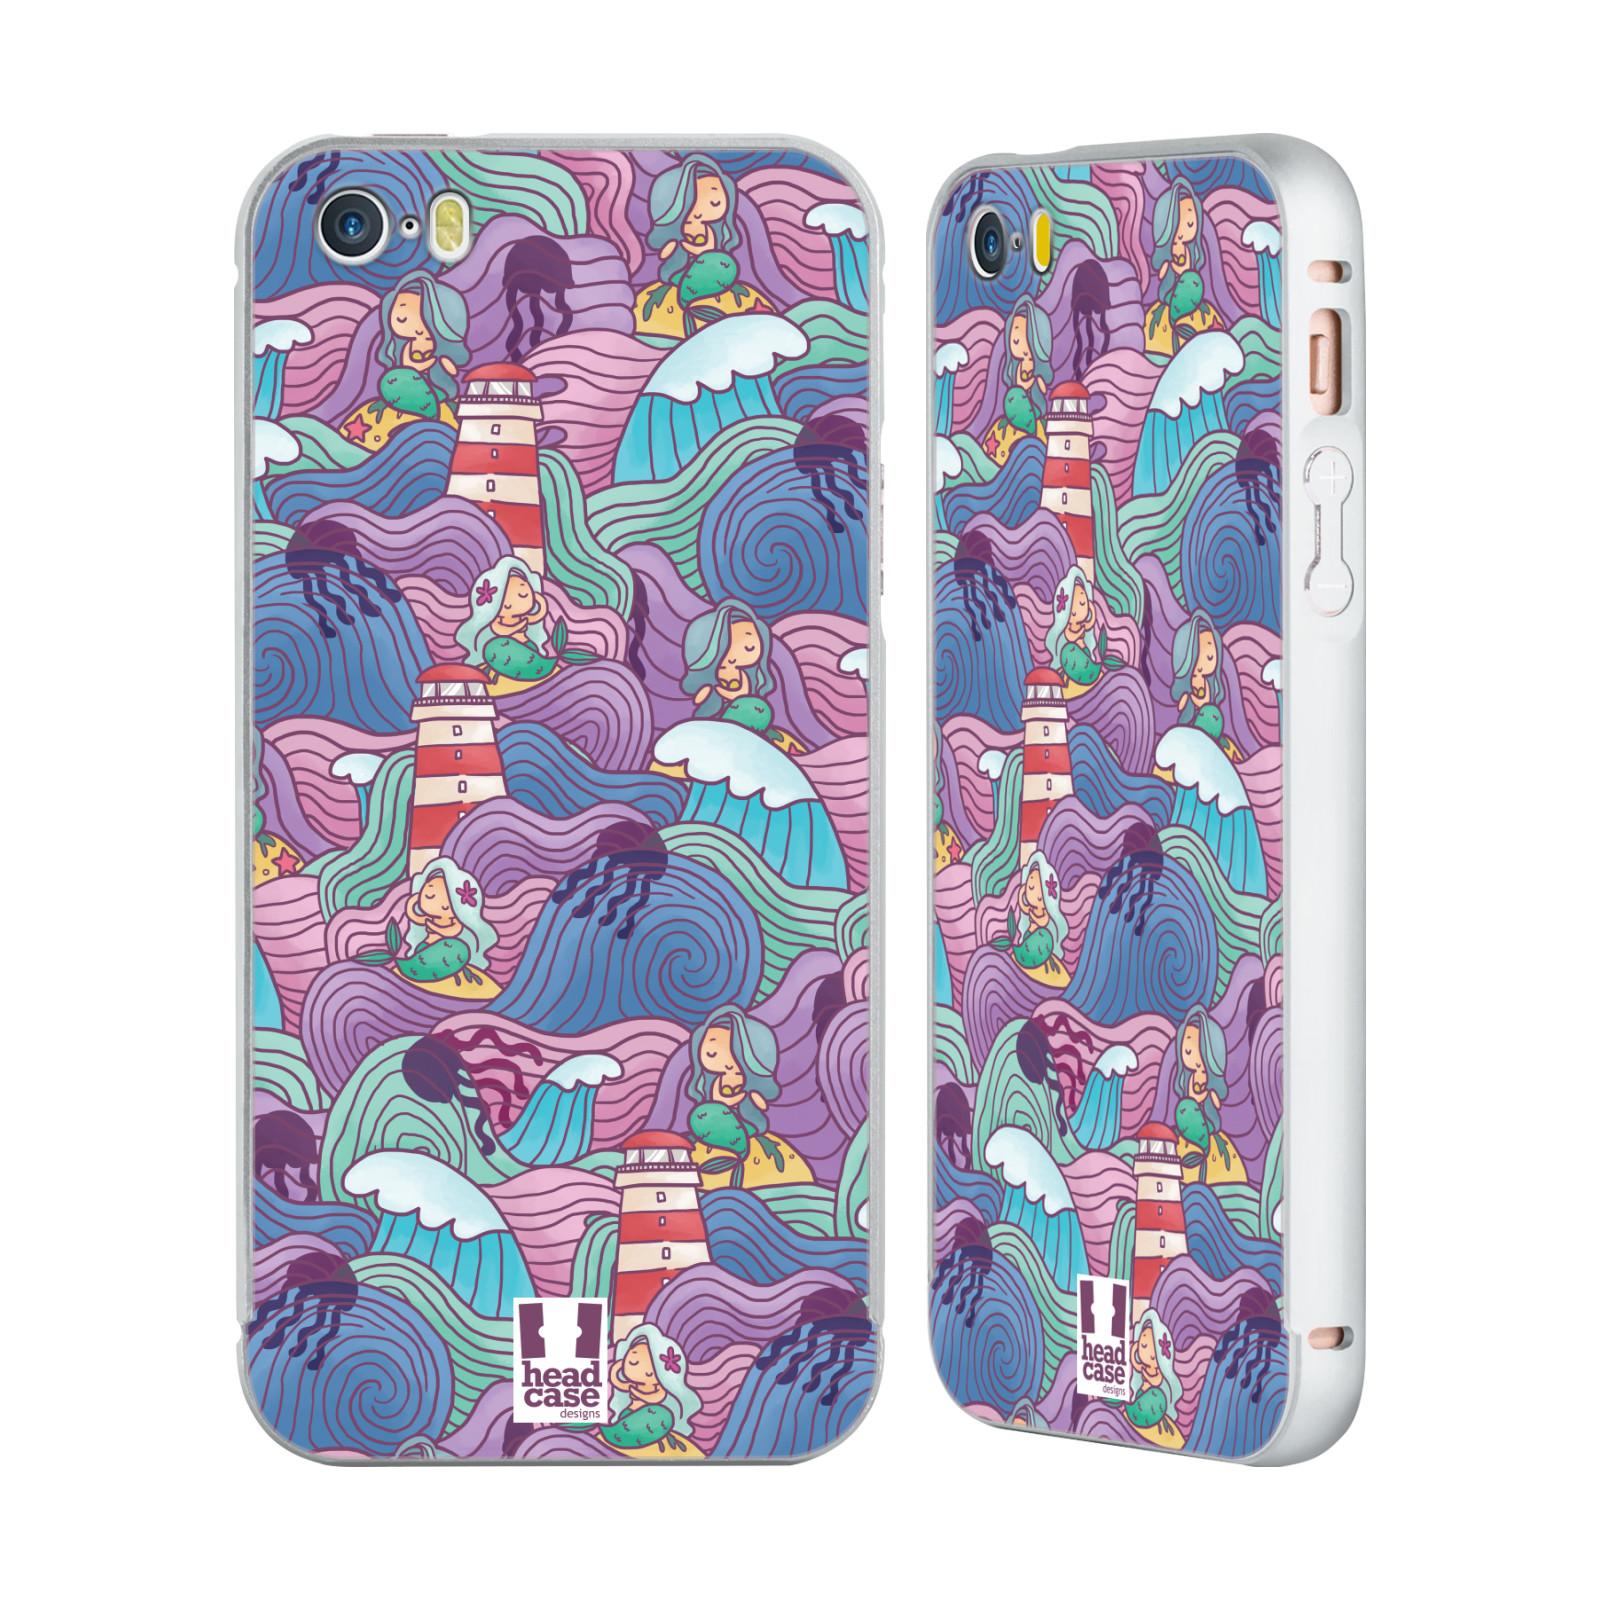 HEAD-CASE-DESIGNS-OCEAN-WAVE-DOODLES-SILVER-SLIDER-CASE-FOR-APPLE-iPHONE-PHONES